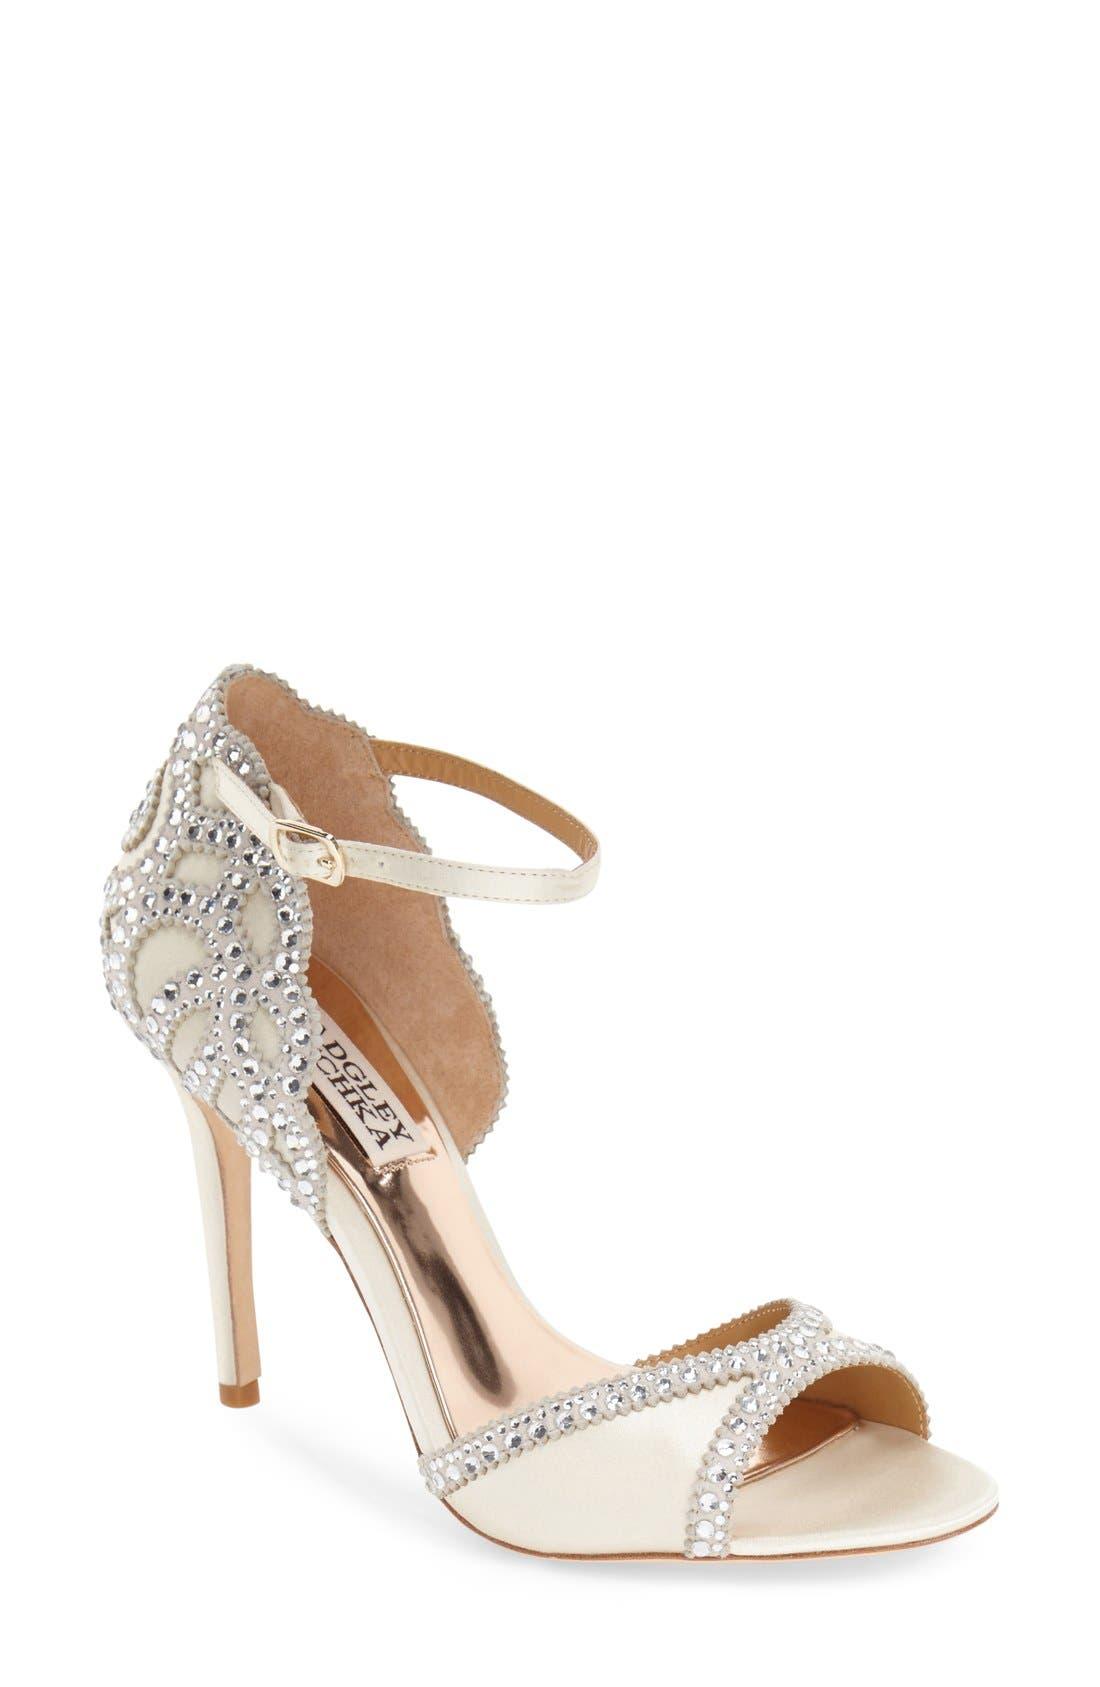 Off-White Peep Toe Heels & High-Heel Shoes for Women | Nordstrom